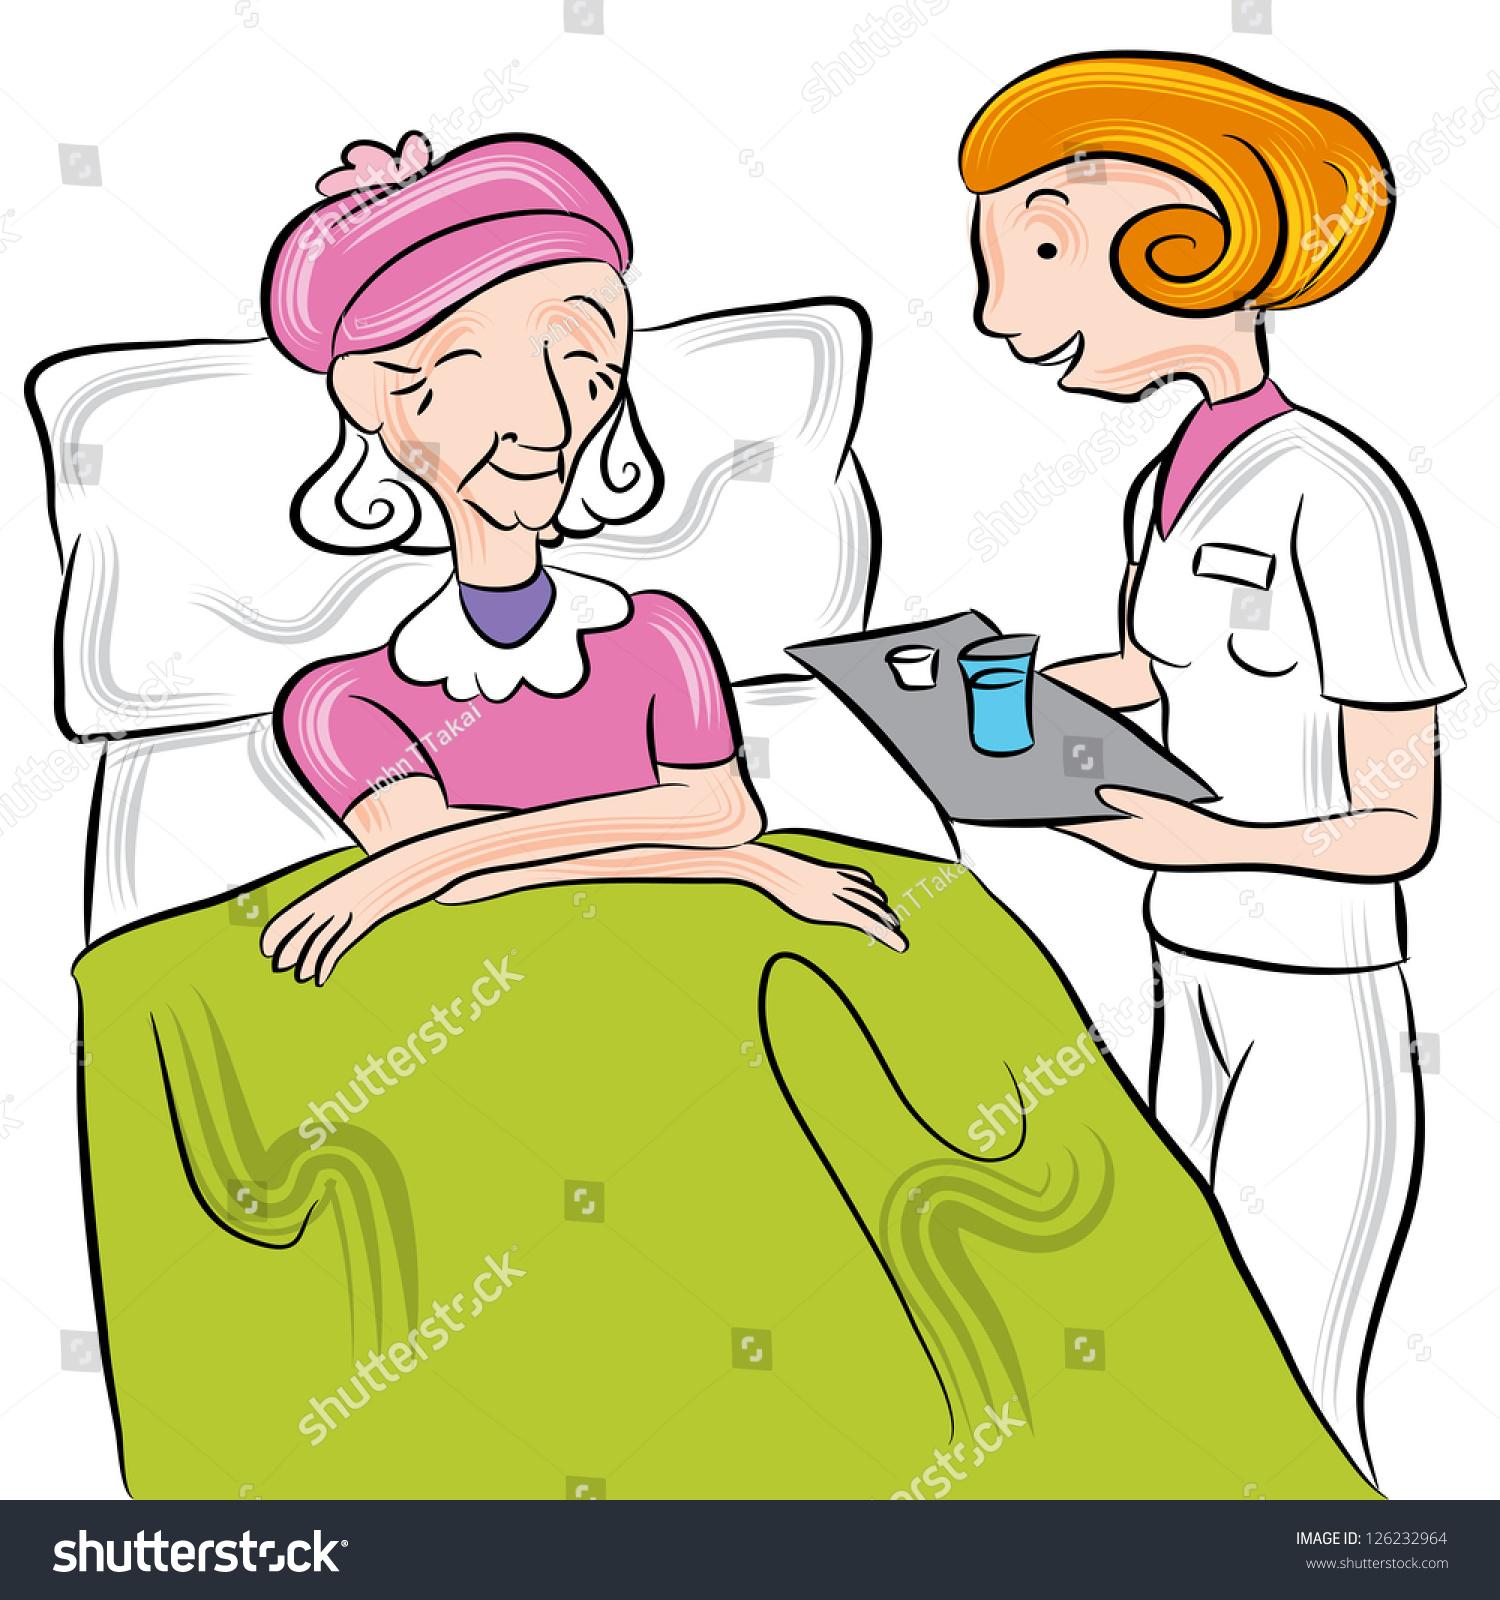 Stock illustrations senior citizen lady with a sign stock clipart - Image Nurse Giving Medication Senior Nursing Stock